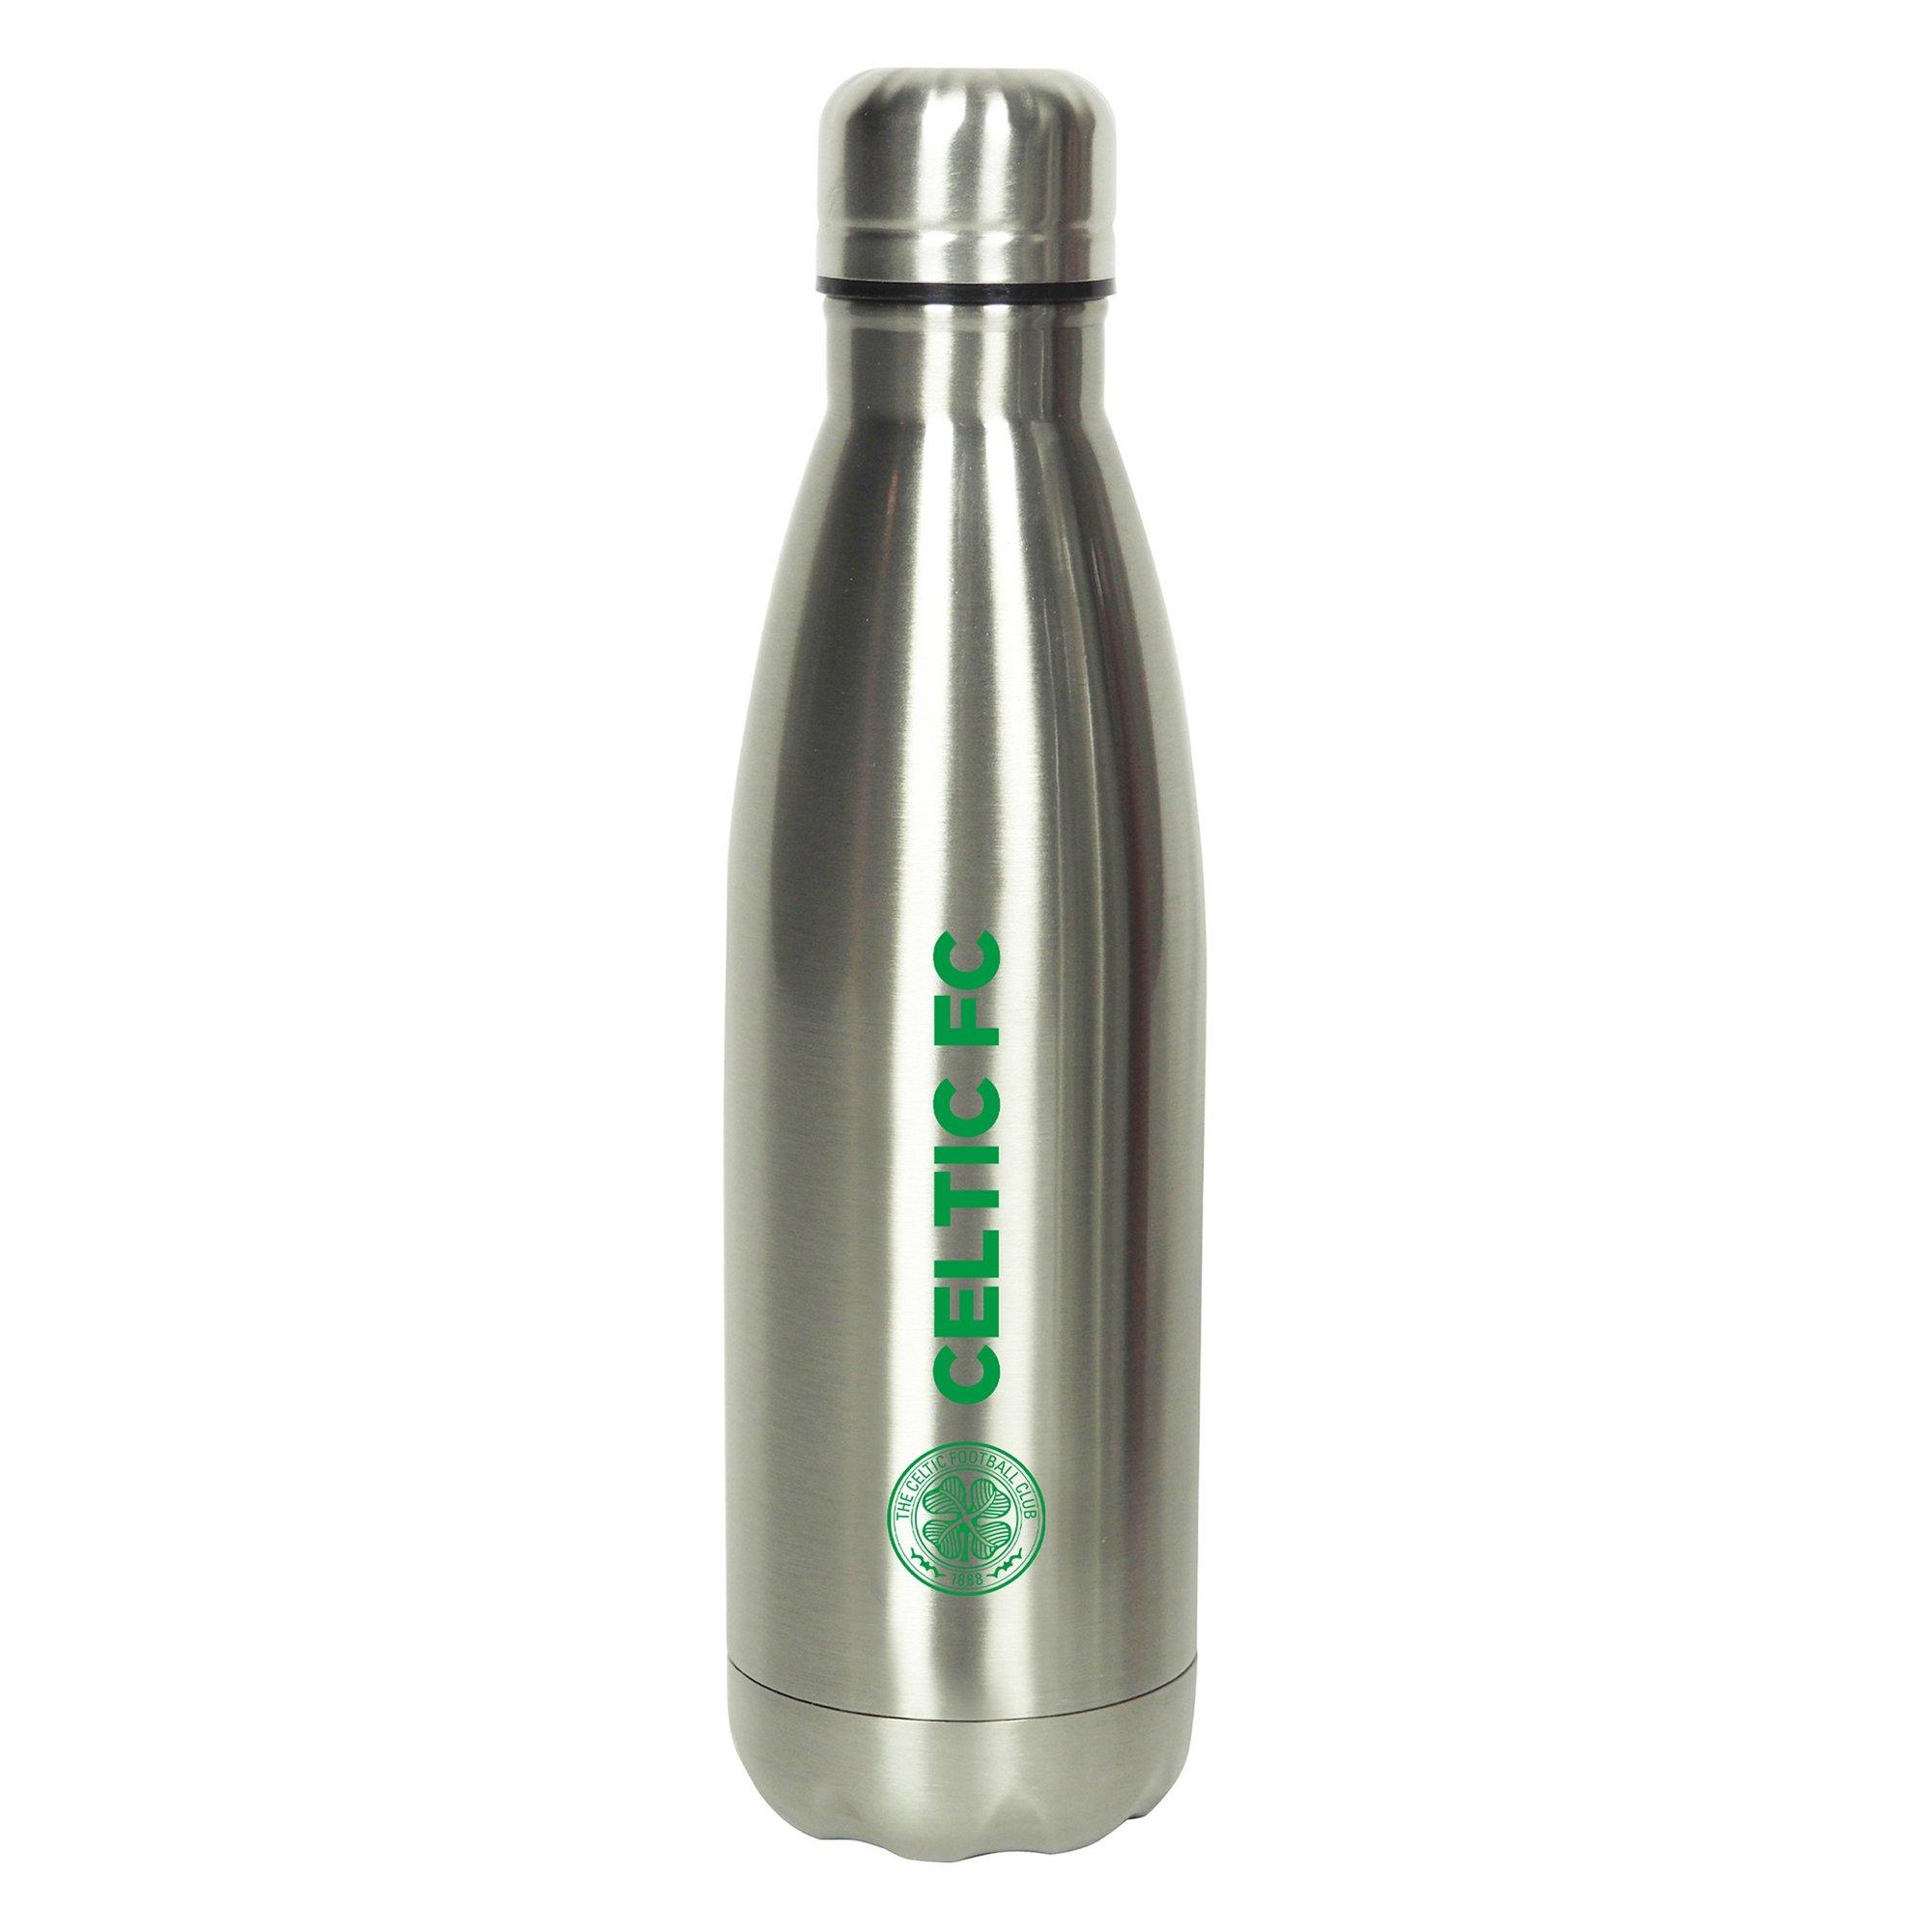 Image of Celtic FC Stainless Steel Drinks Bottle